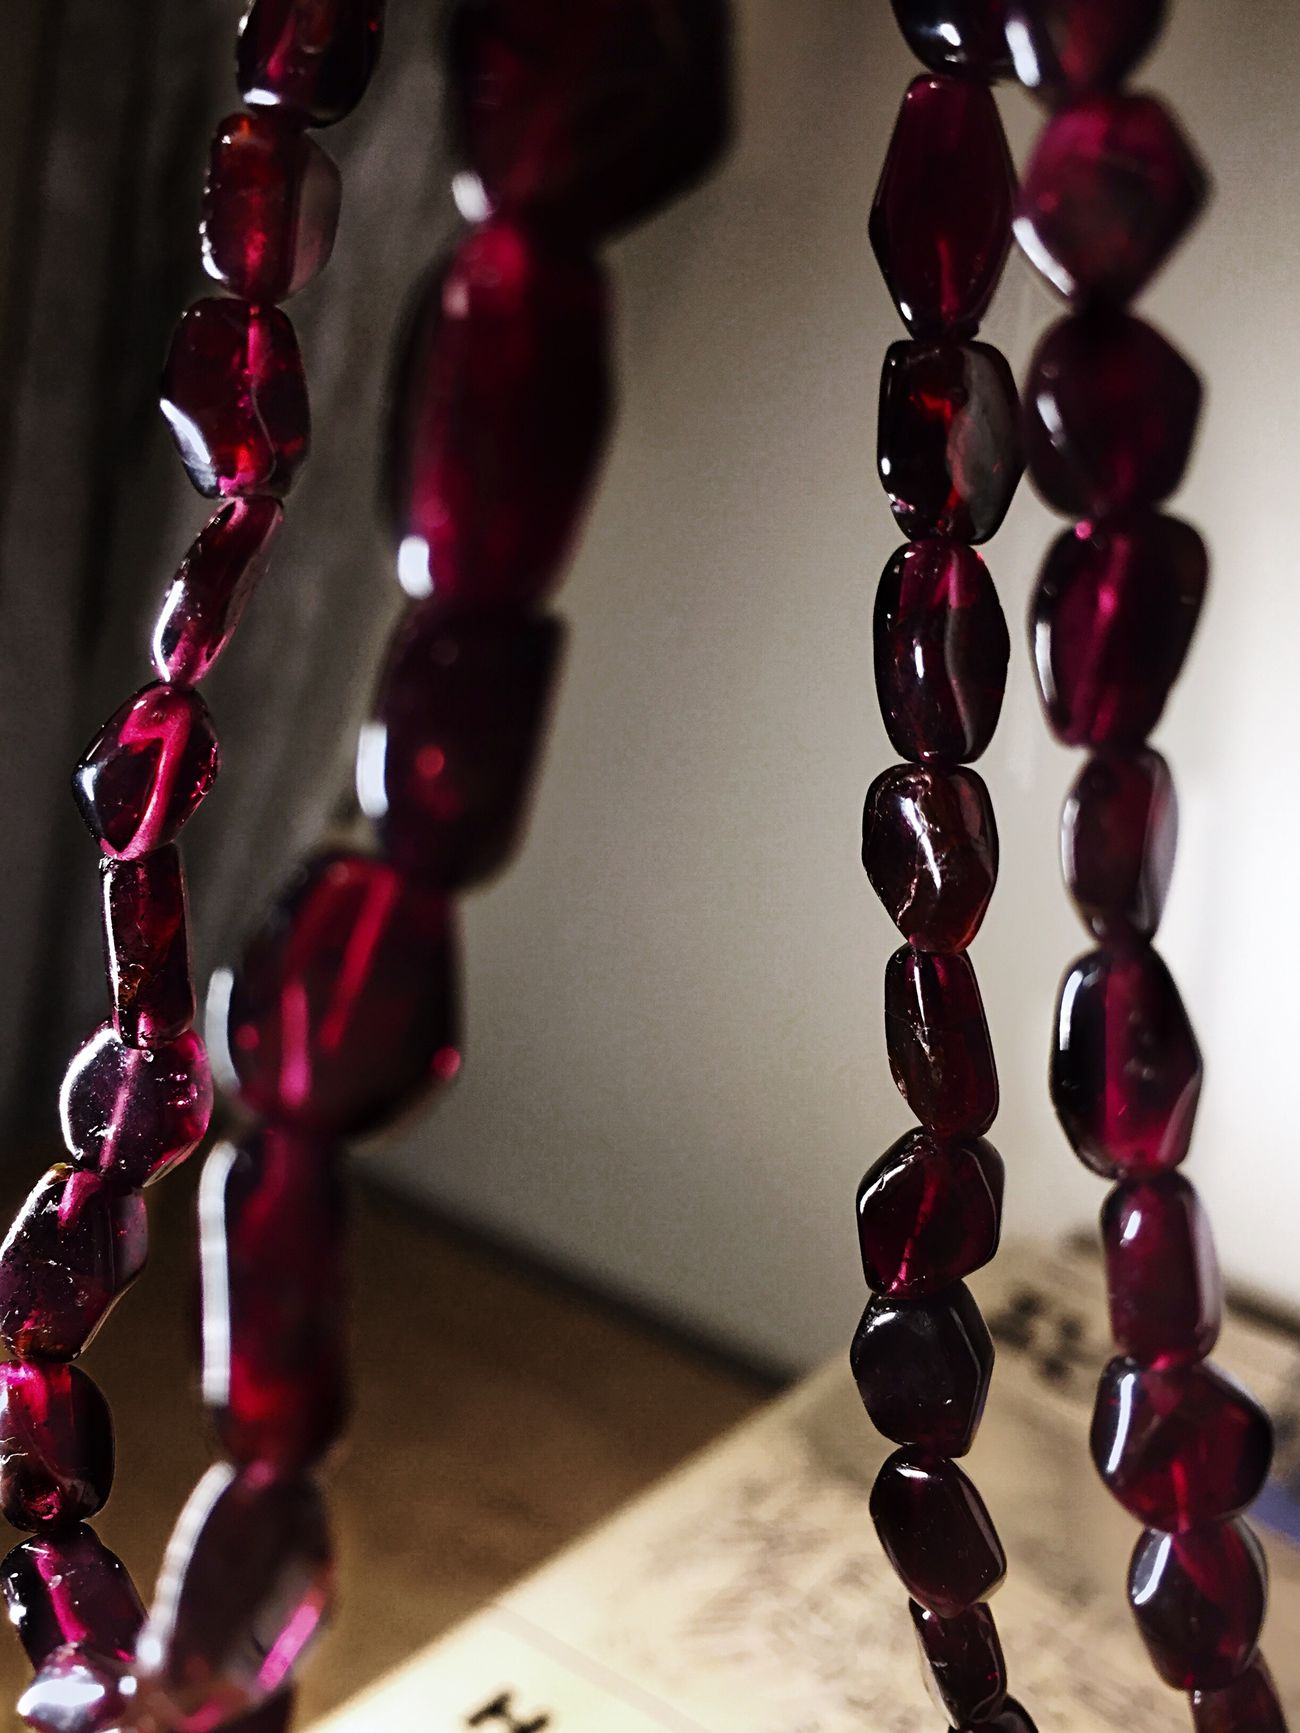 Jewlery Garnet Rocks Preciousstones Necklace Red Hanging